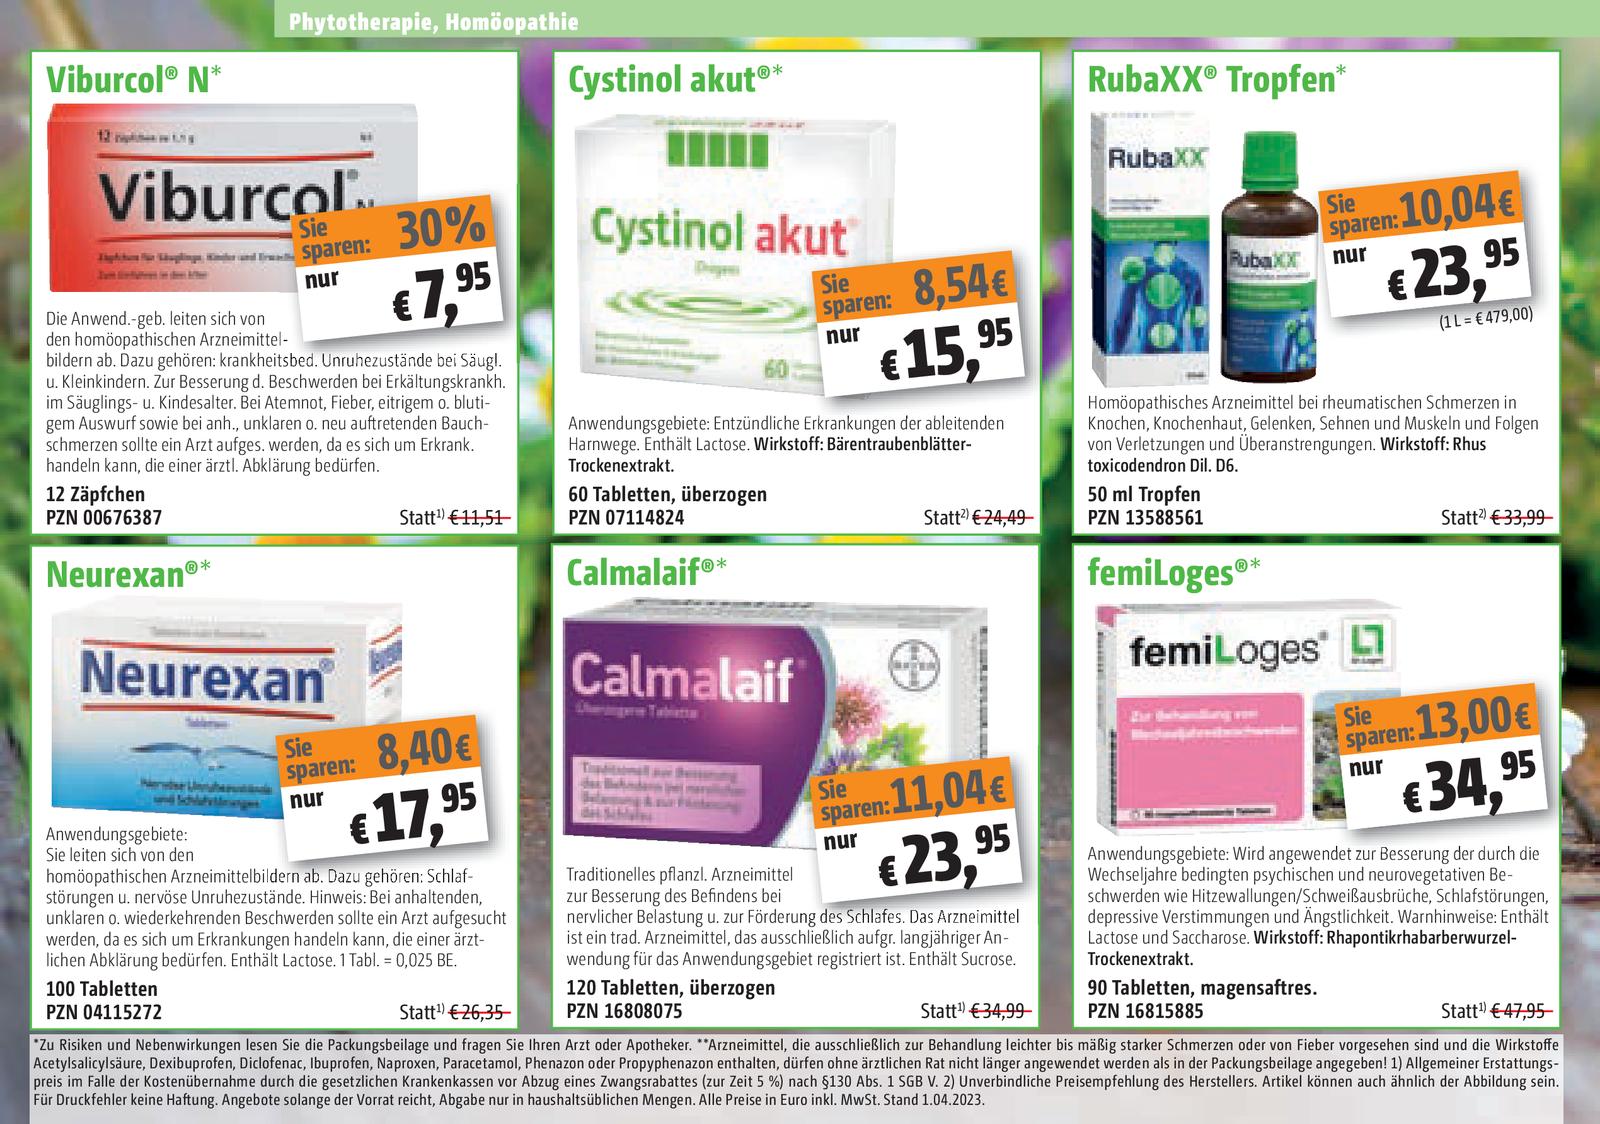 https://mein-uploads.apocdn.net/5424/leaflets/5424_flyer-Seite24.png